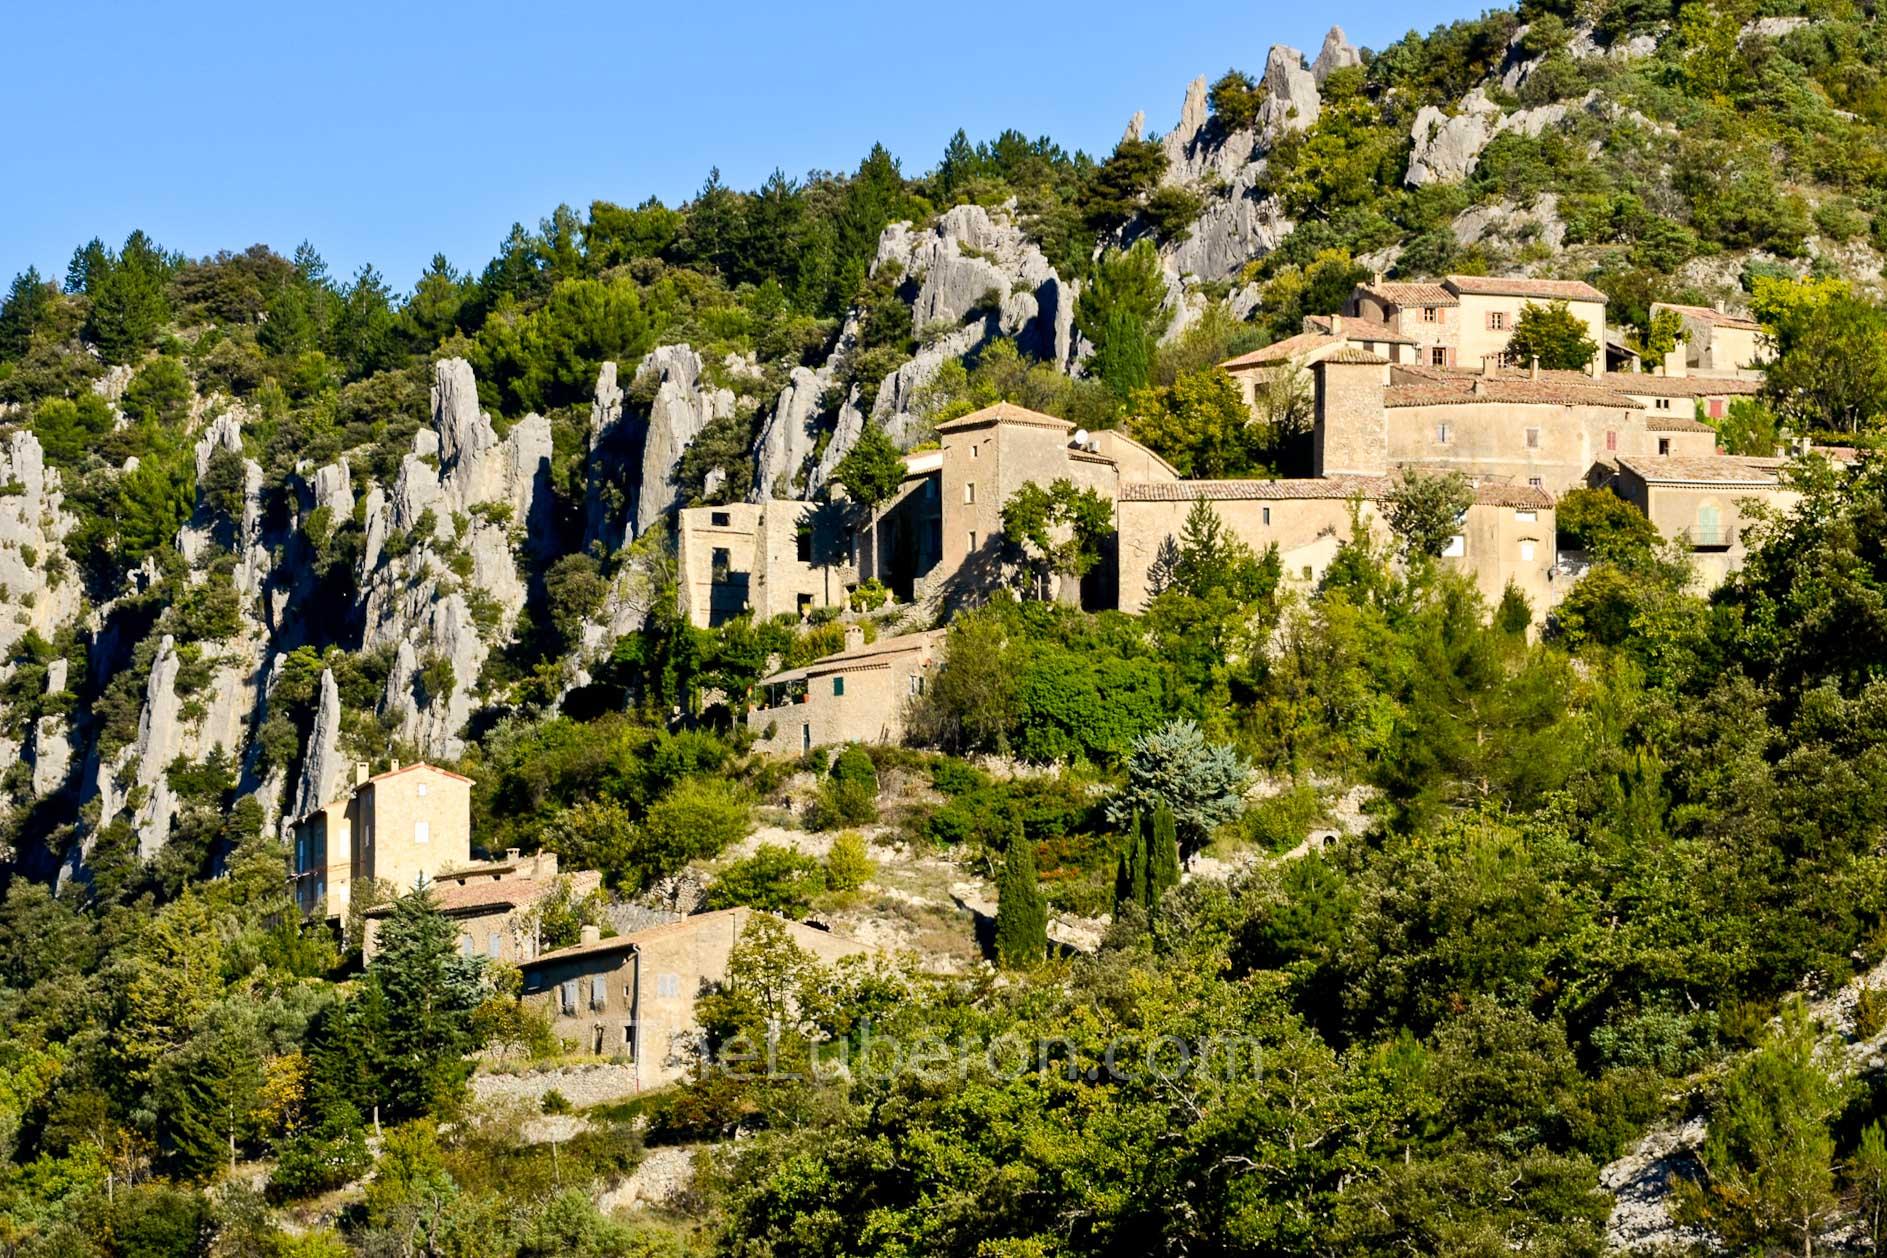 Brantes village in the Ventoux